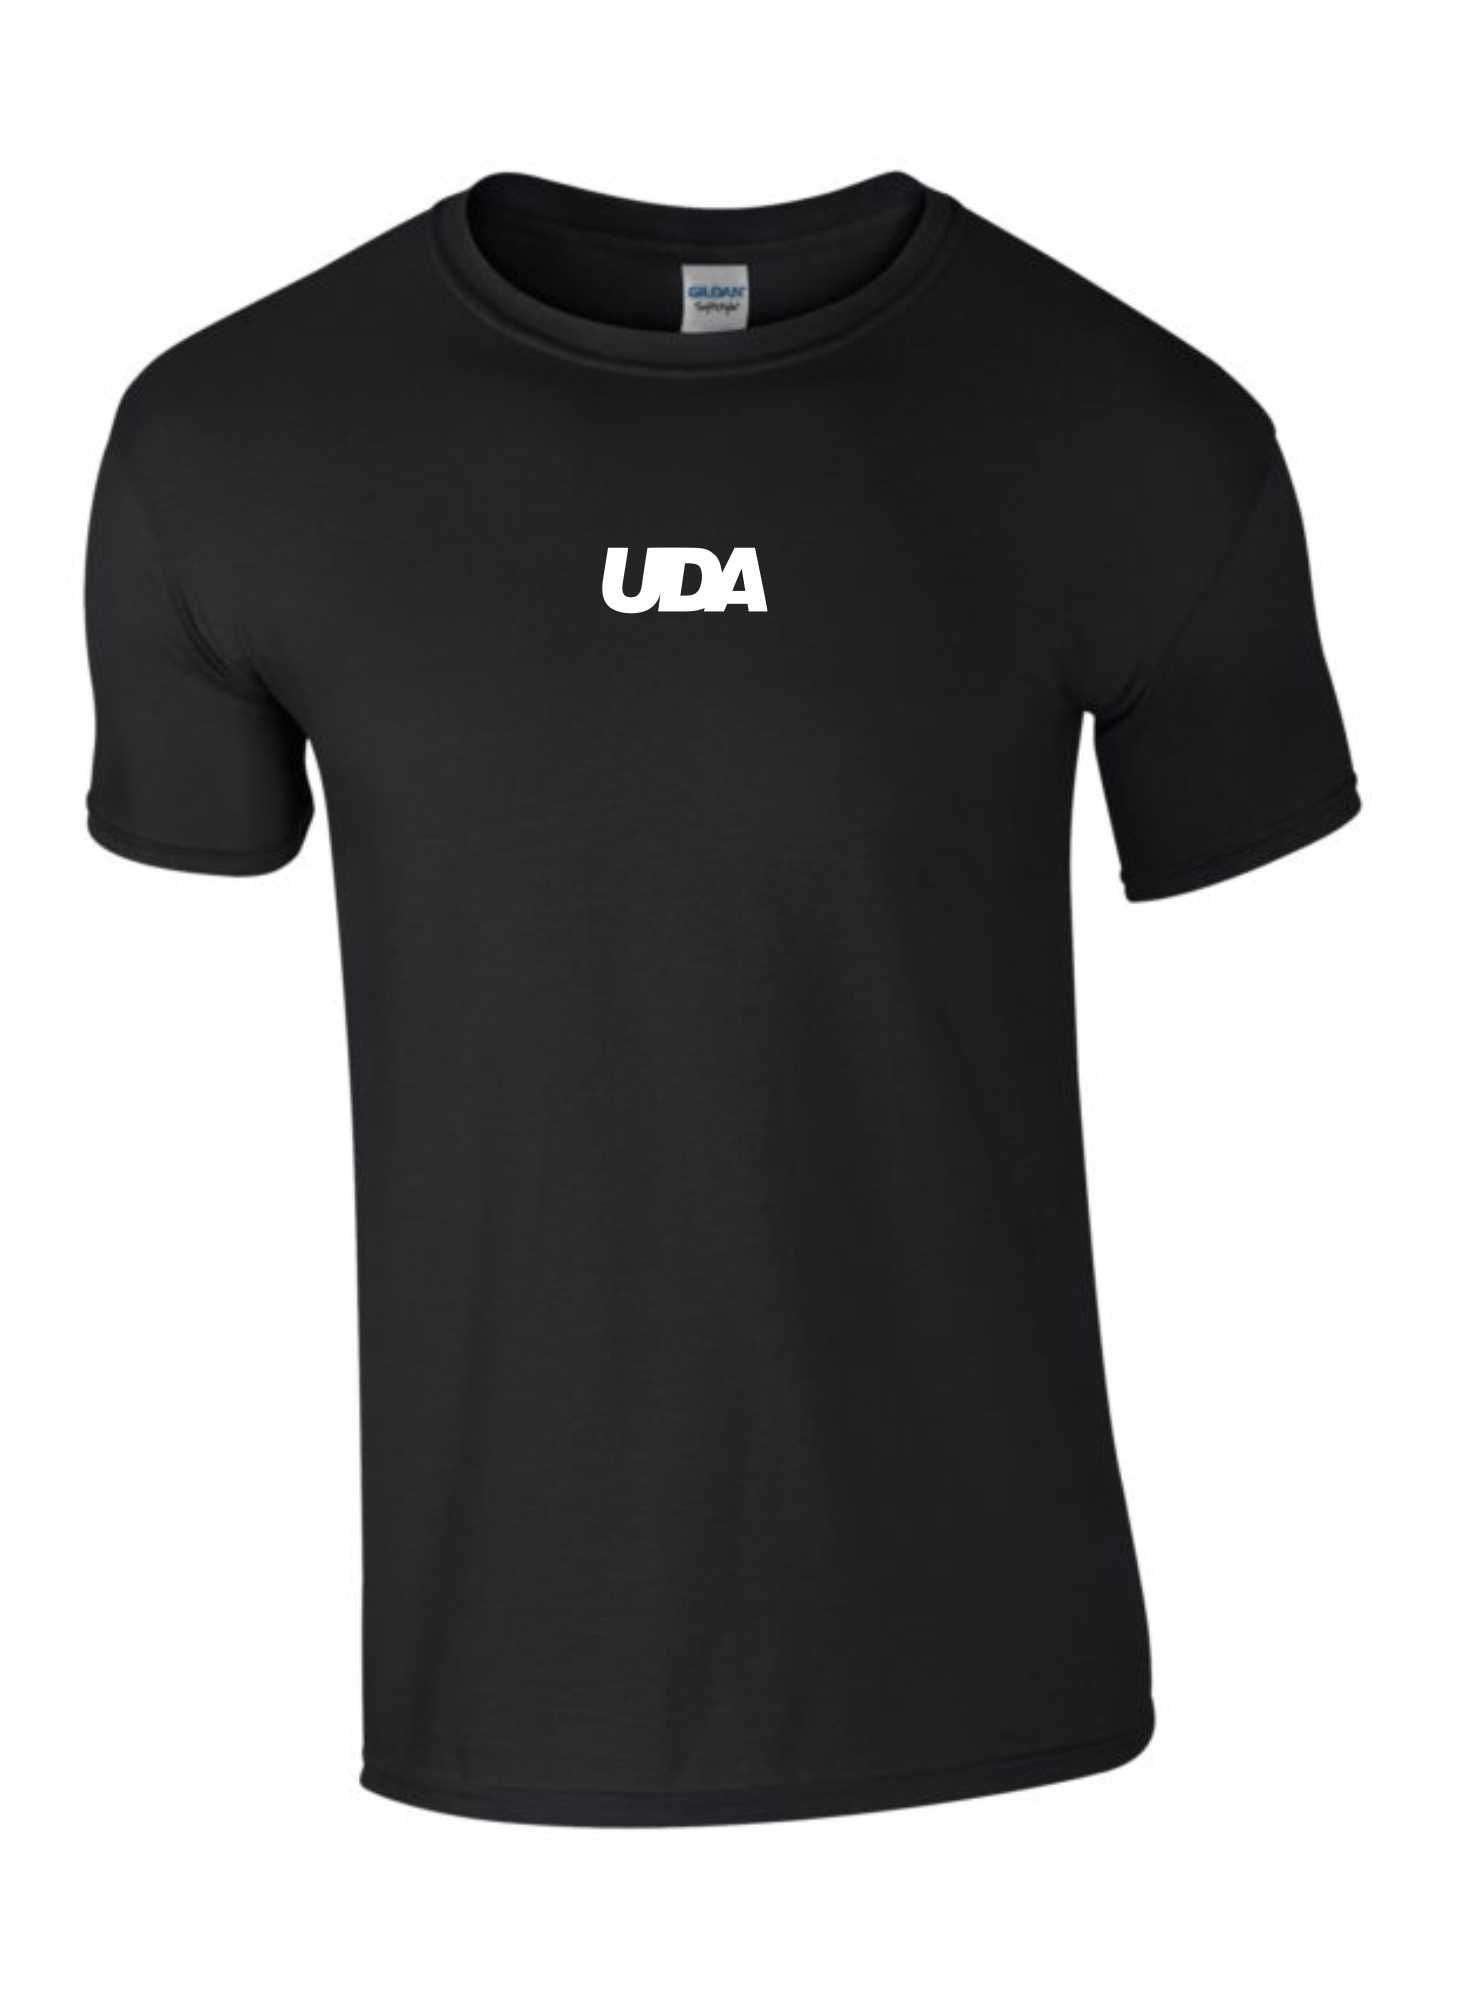 LIMITED EDITION: UDA – Kids T-Shirt (Black & White)